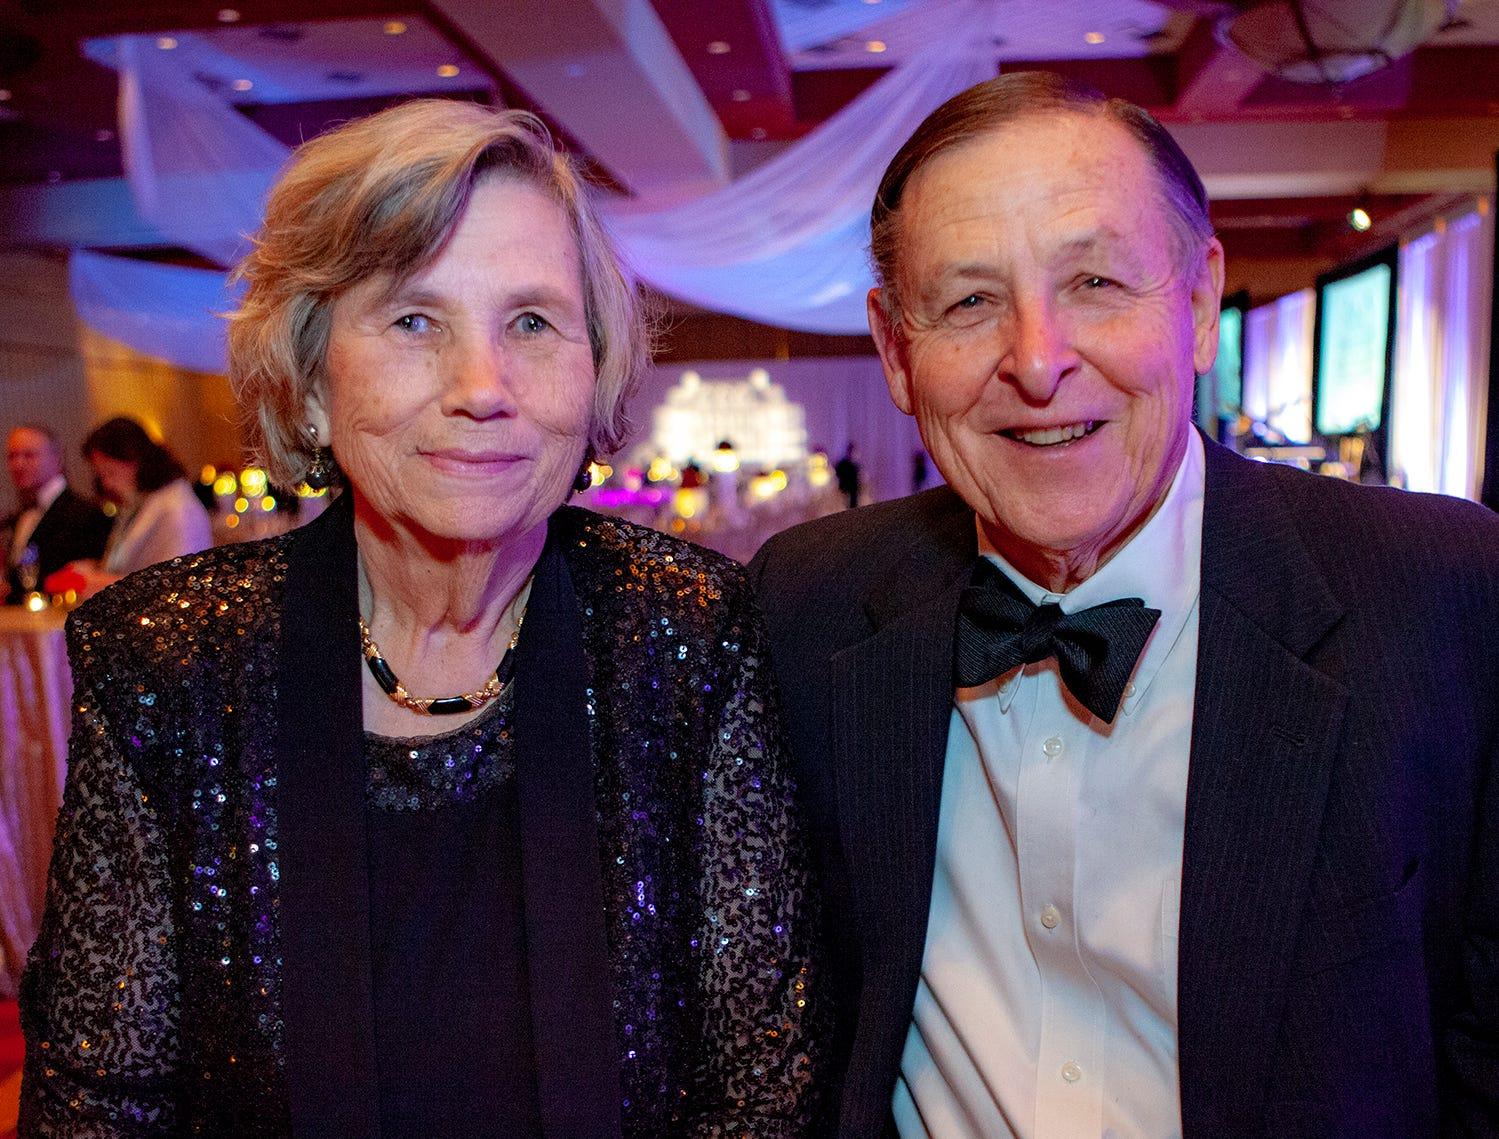 Glenda and Paul Dyer at the 2019 Saint Thomas Rutherford Foundation Gala on Saturday, Jan. 19, 2019 at Embassy Suites Murfreesboro.